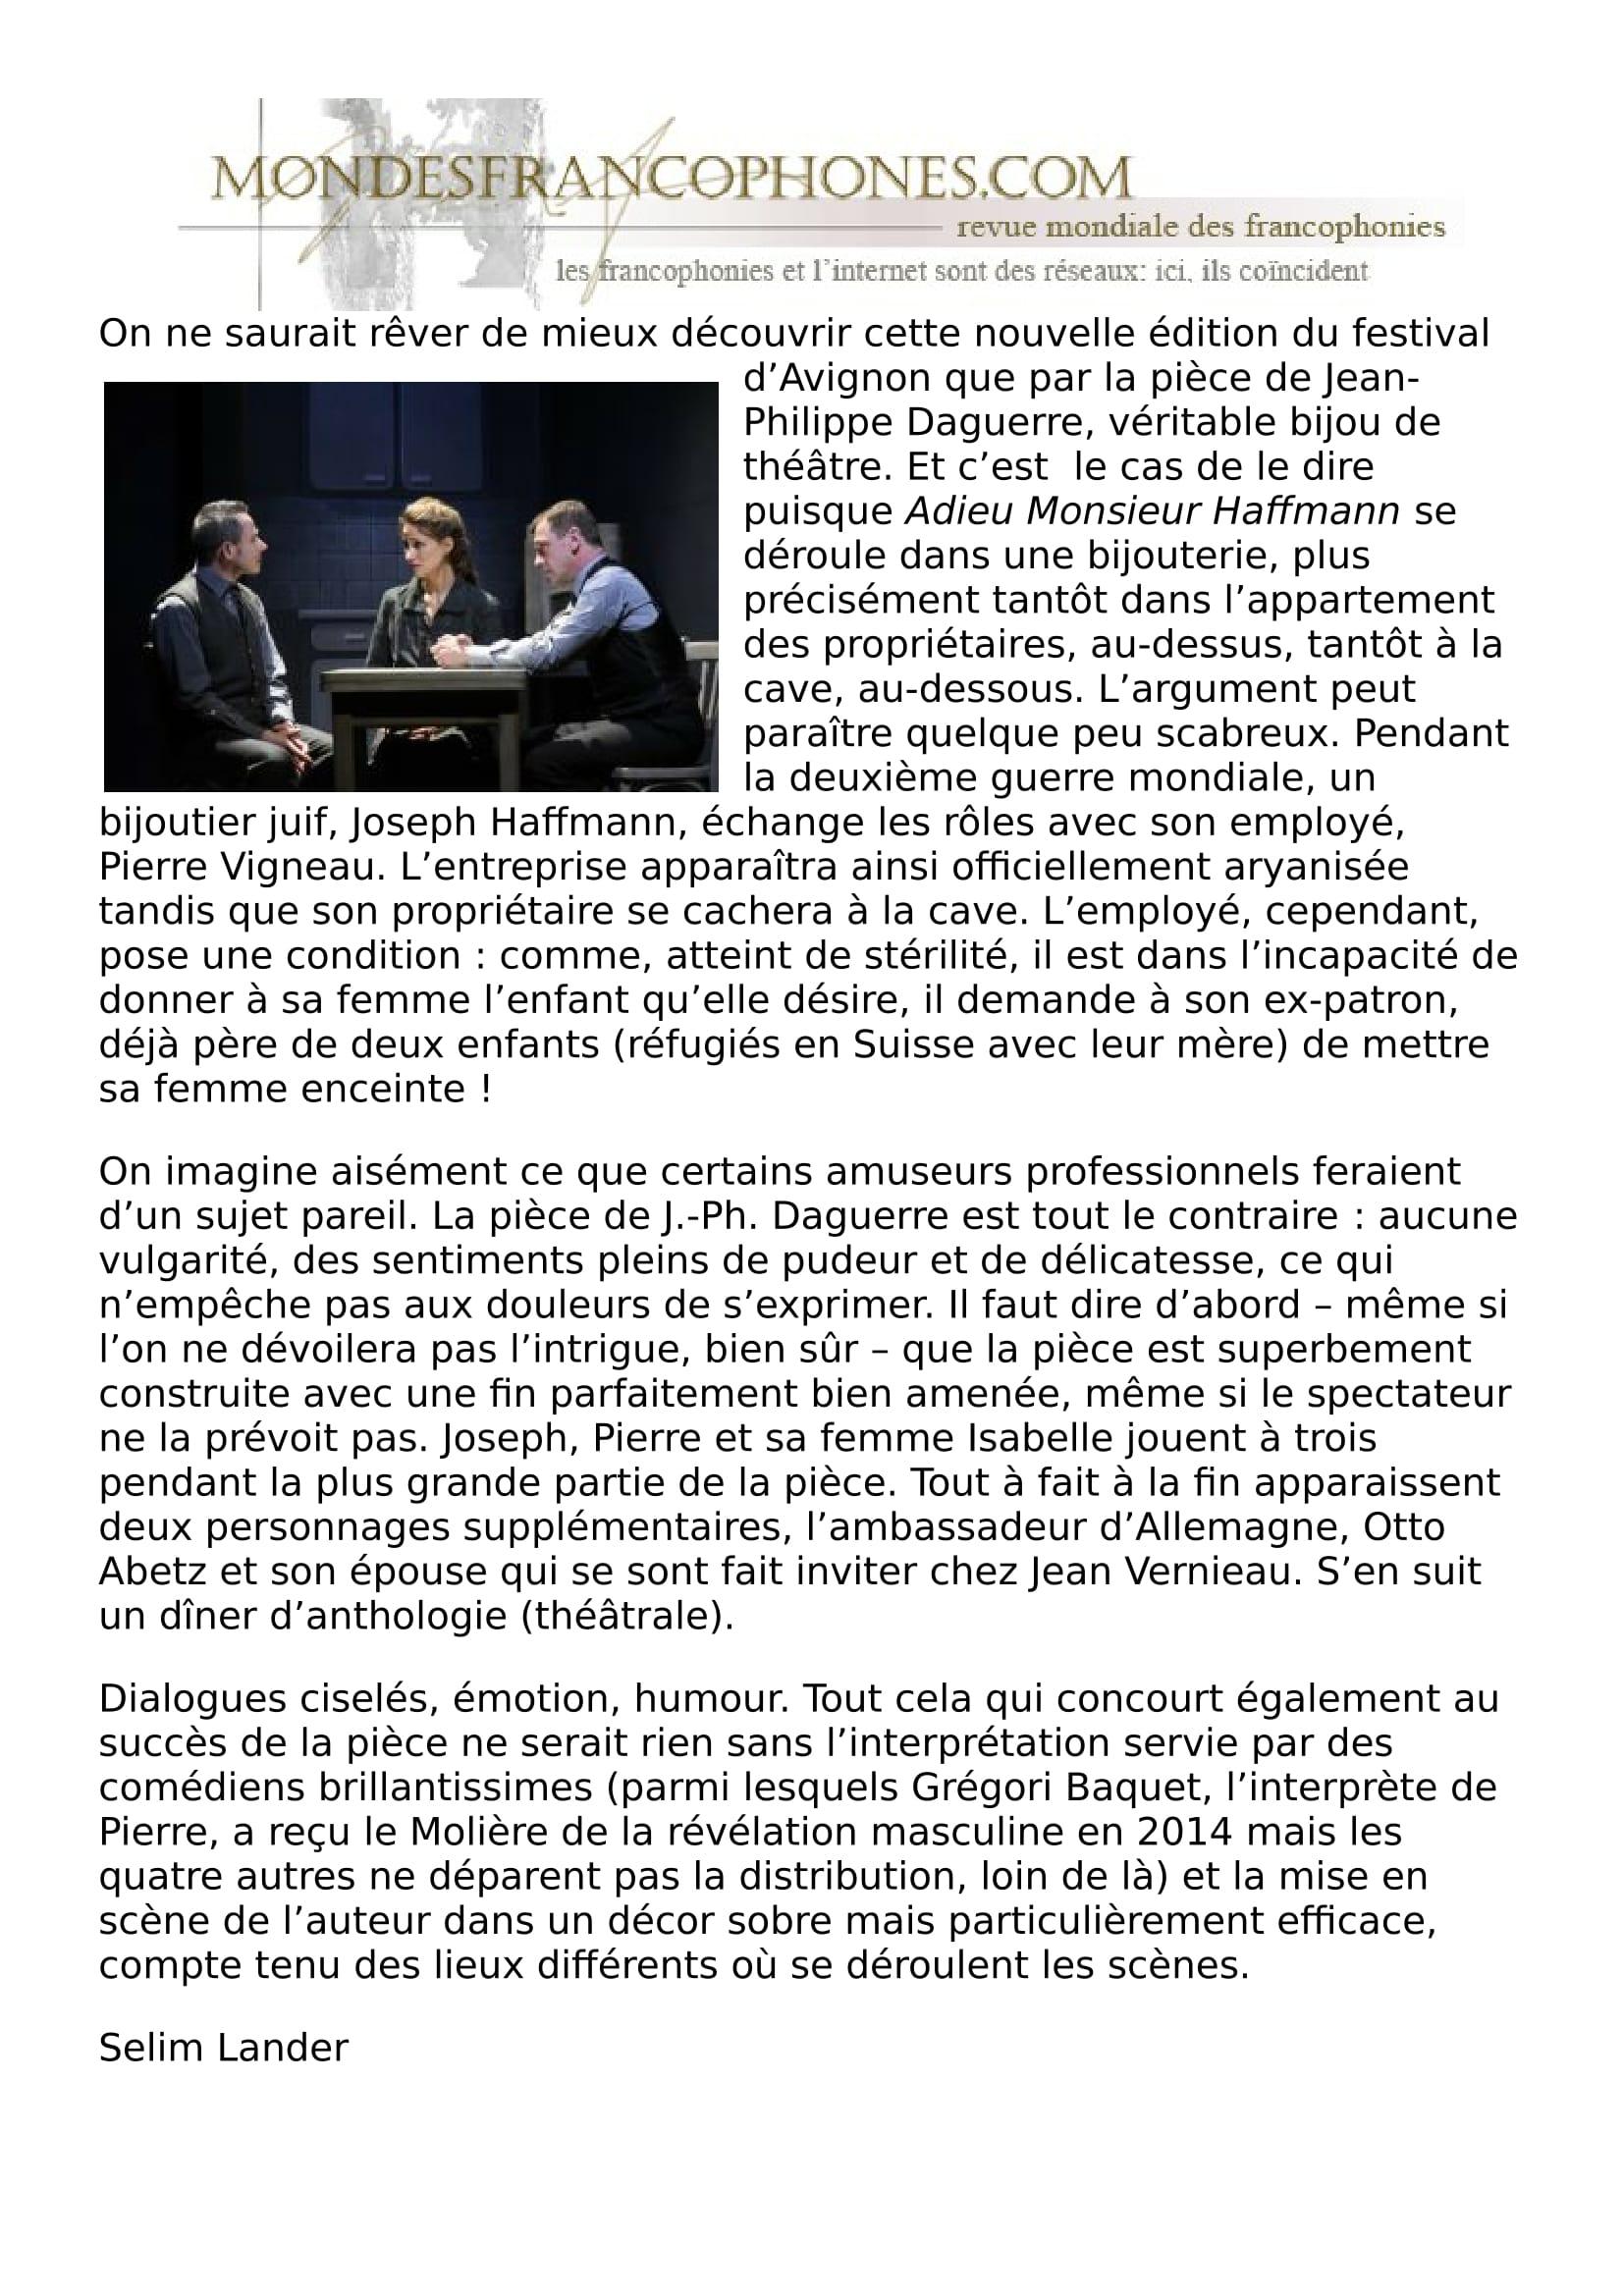 Avignon2017-z-site-MondesFrancophones-AdieuHaffmann-1